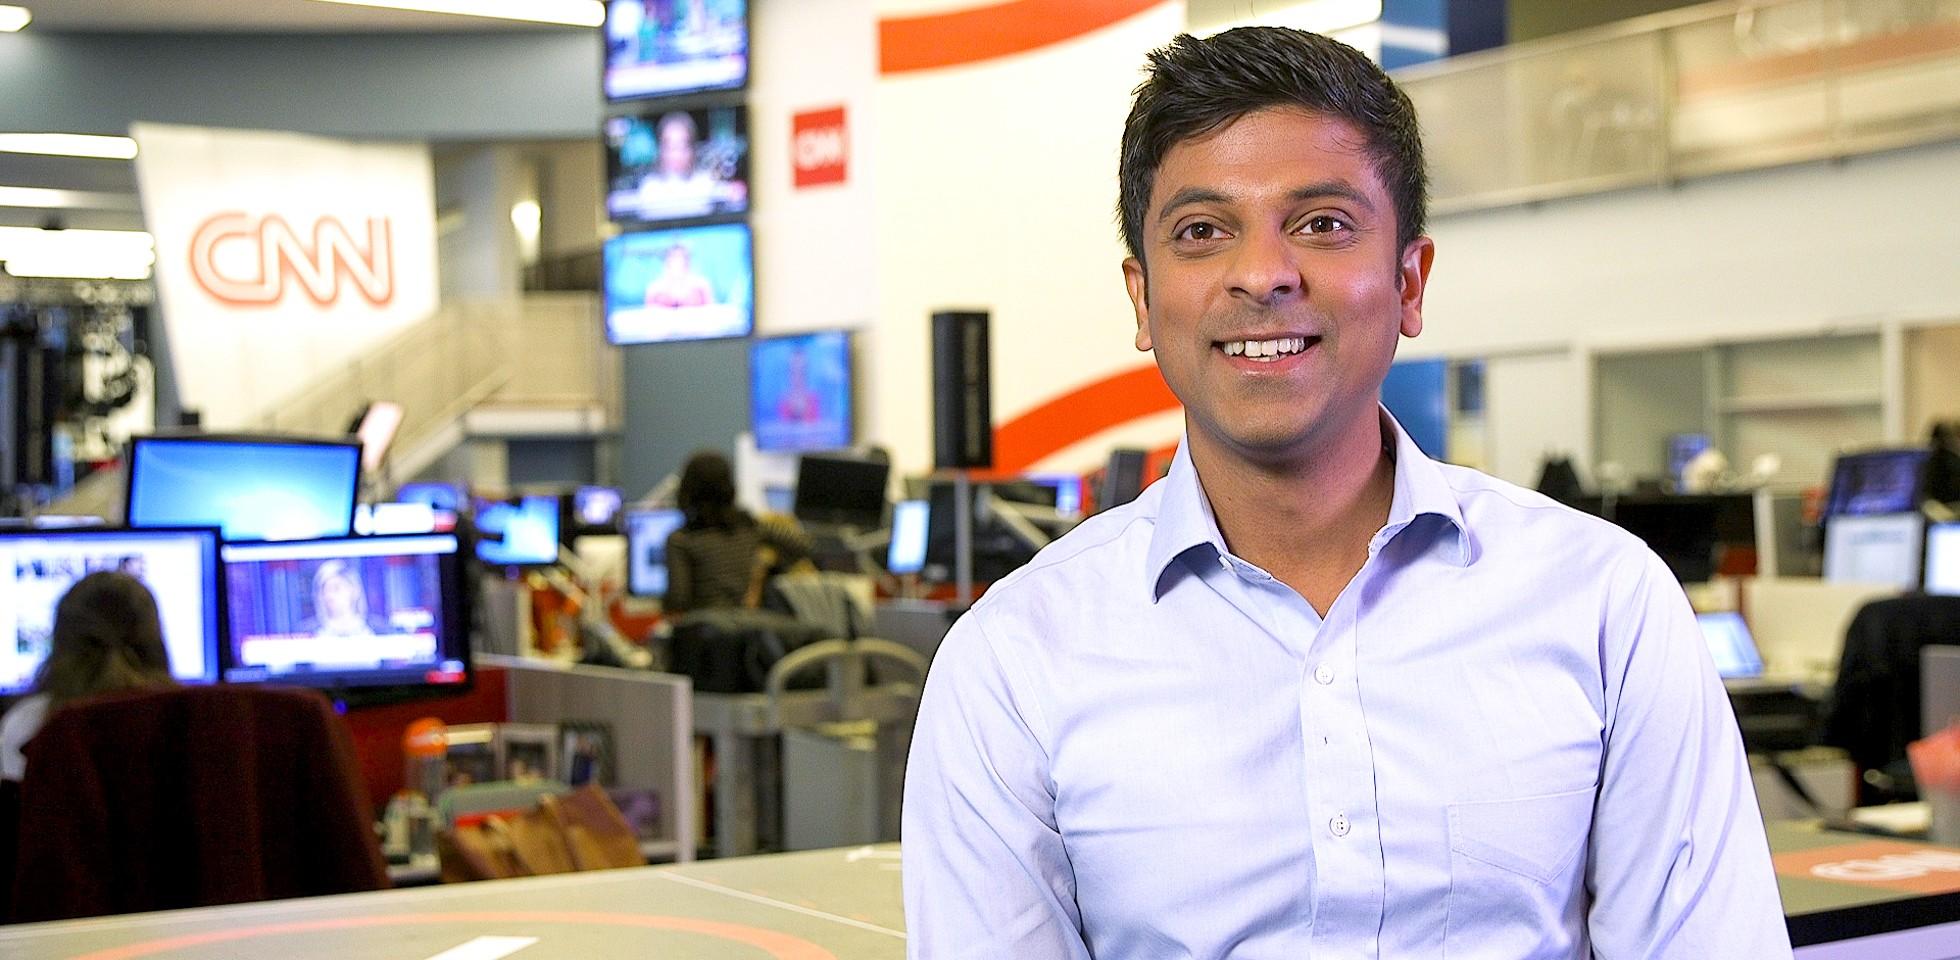 Sura, Director, Distribution - CNN Digital Careers